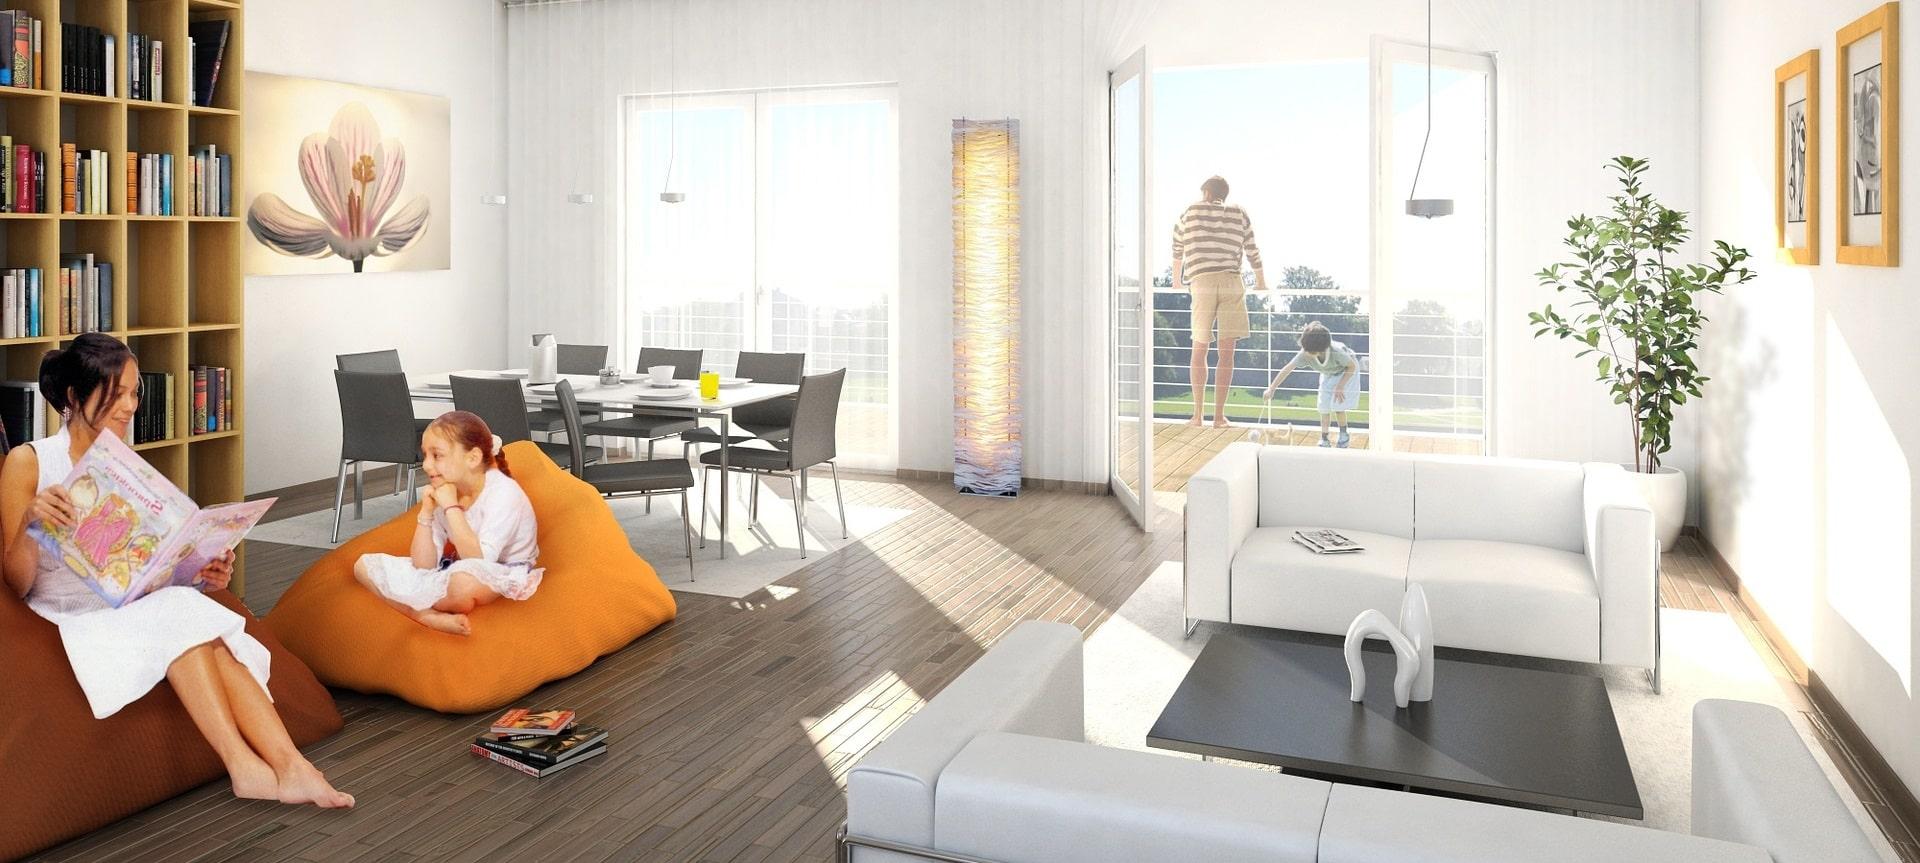 Flik & Company - Interior Design, Furniture, Decoration Ideas for ...